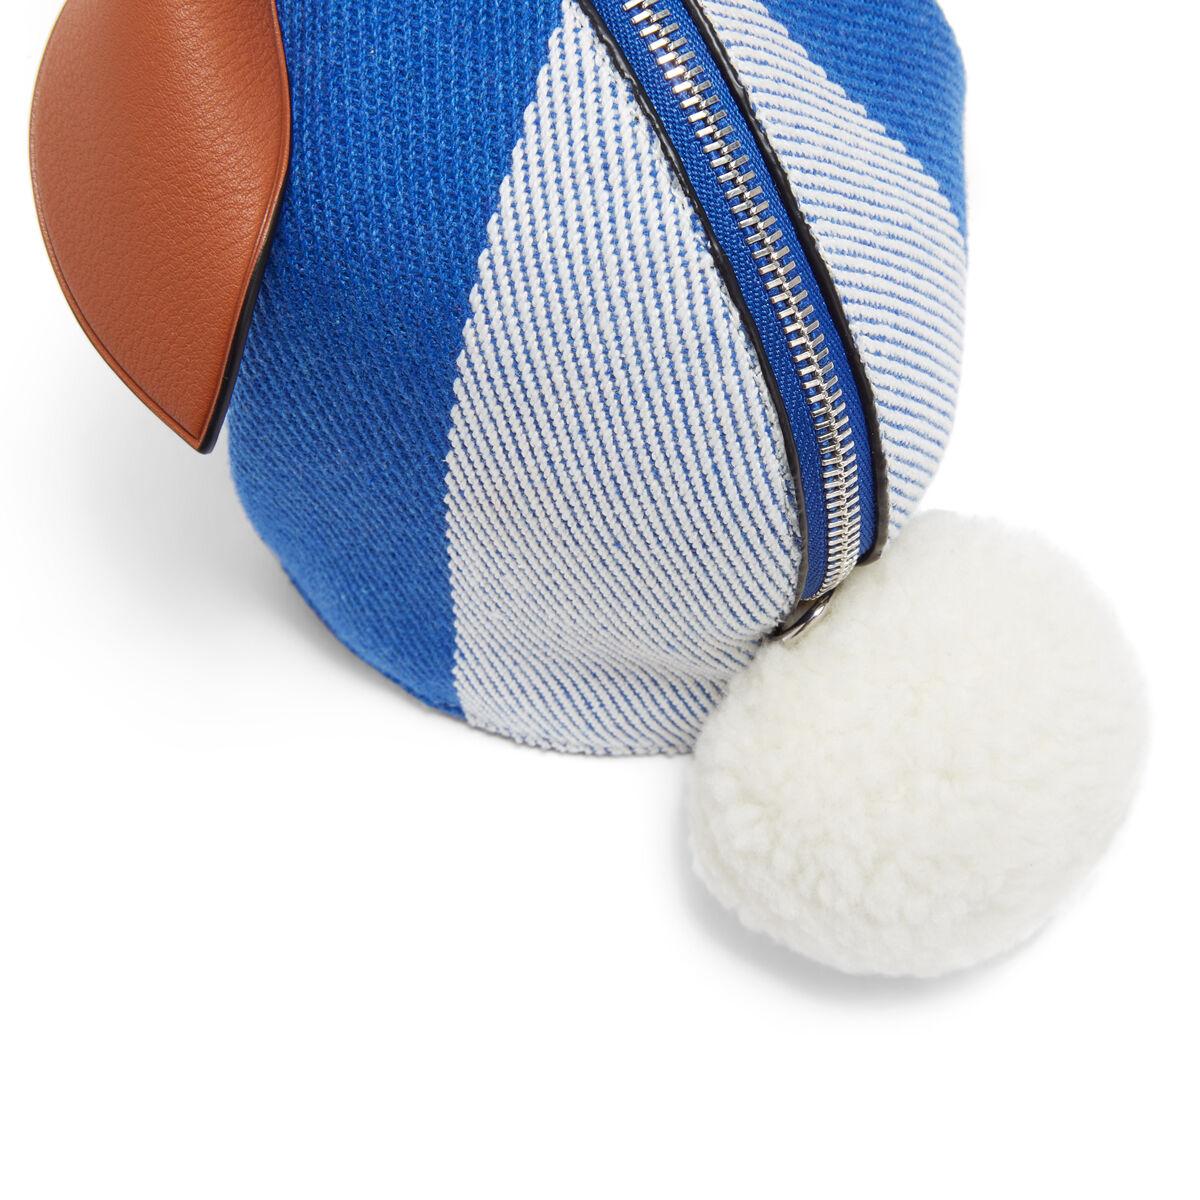 LOEWE Bunny Stripes Mini Bag Pacific Blue/Multicolor all